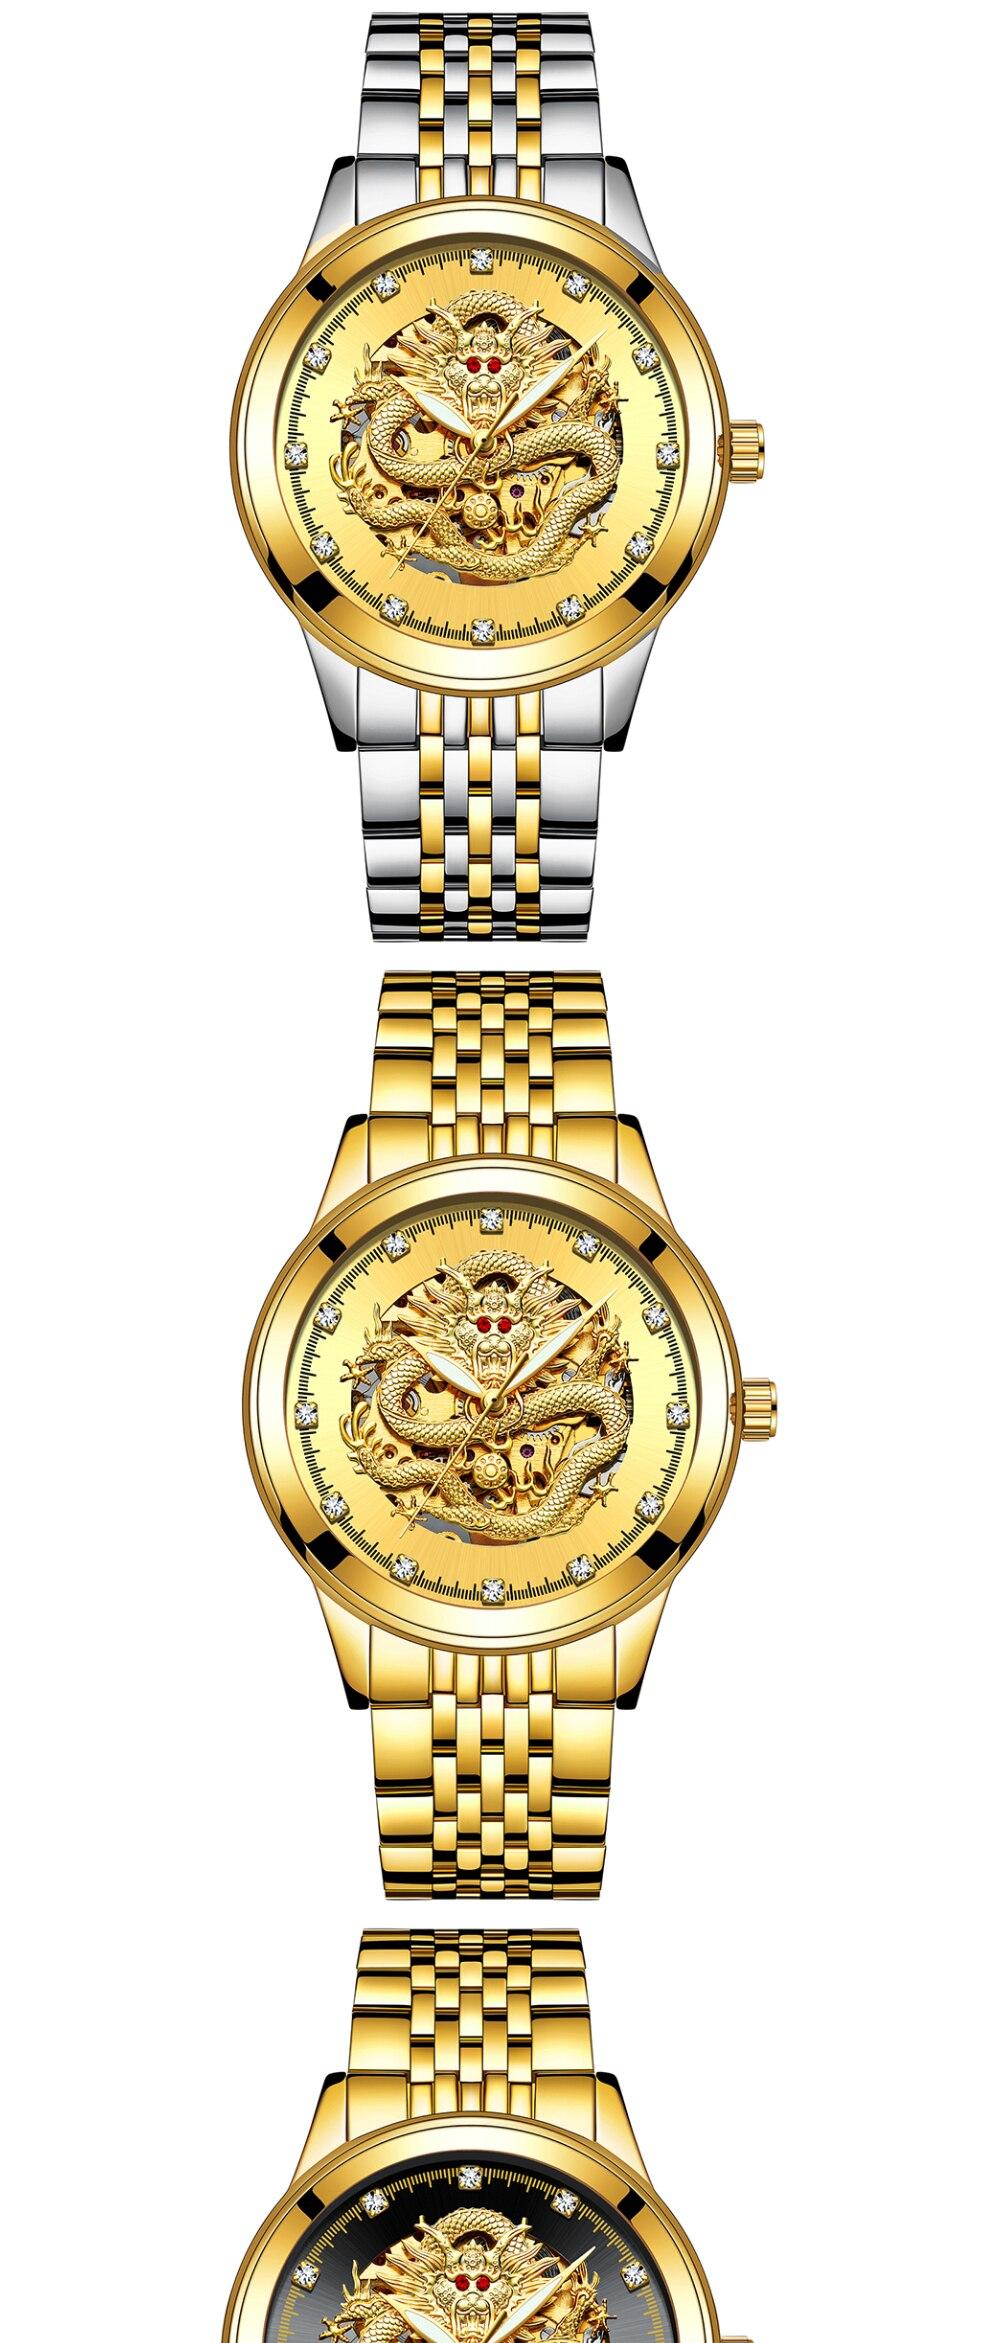 HTB1ngkbgAzoK1RjSZFlq6yi4VXaV TEVISE Men Mechanical Watch Luxurious Automatic Winding Watches Waterproof Skeleton Hollow Gold Dragon Clock Relogio Masculino